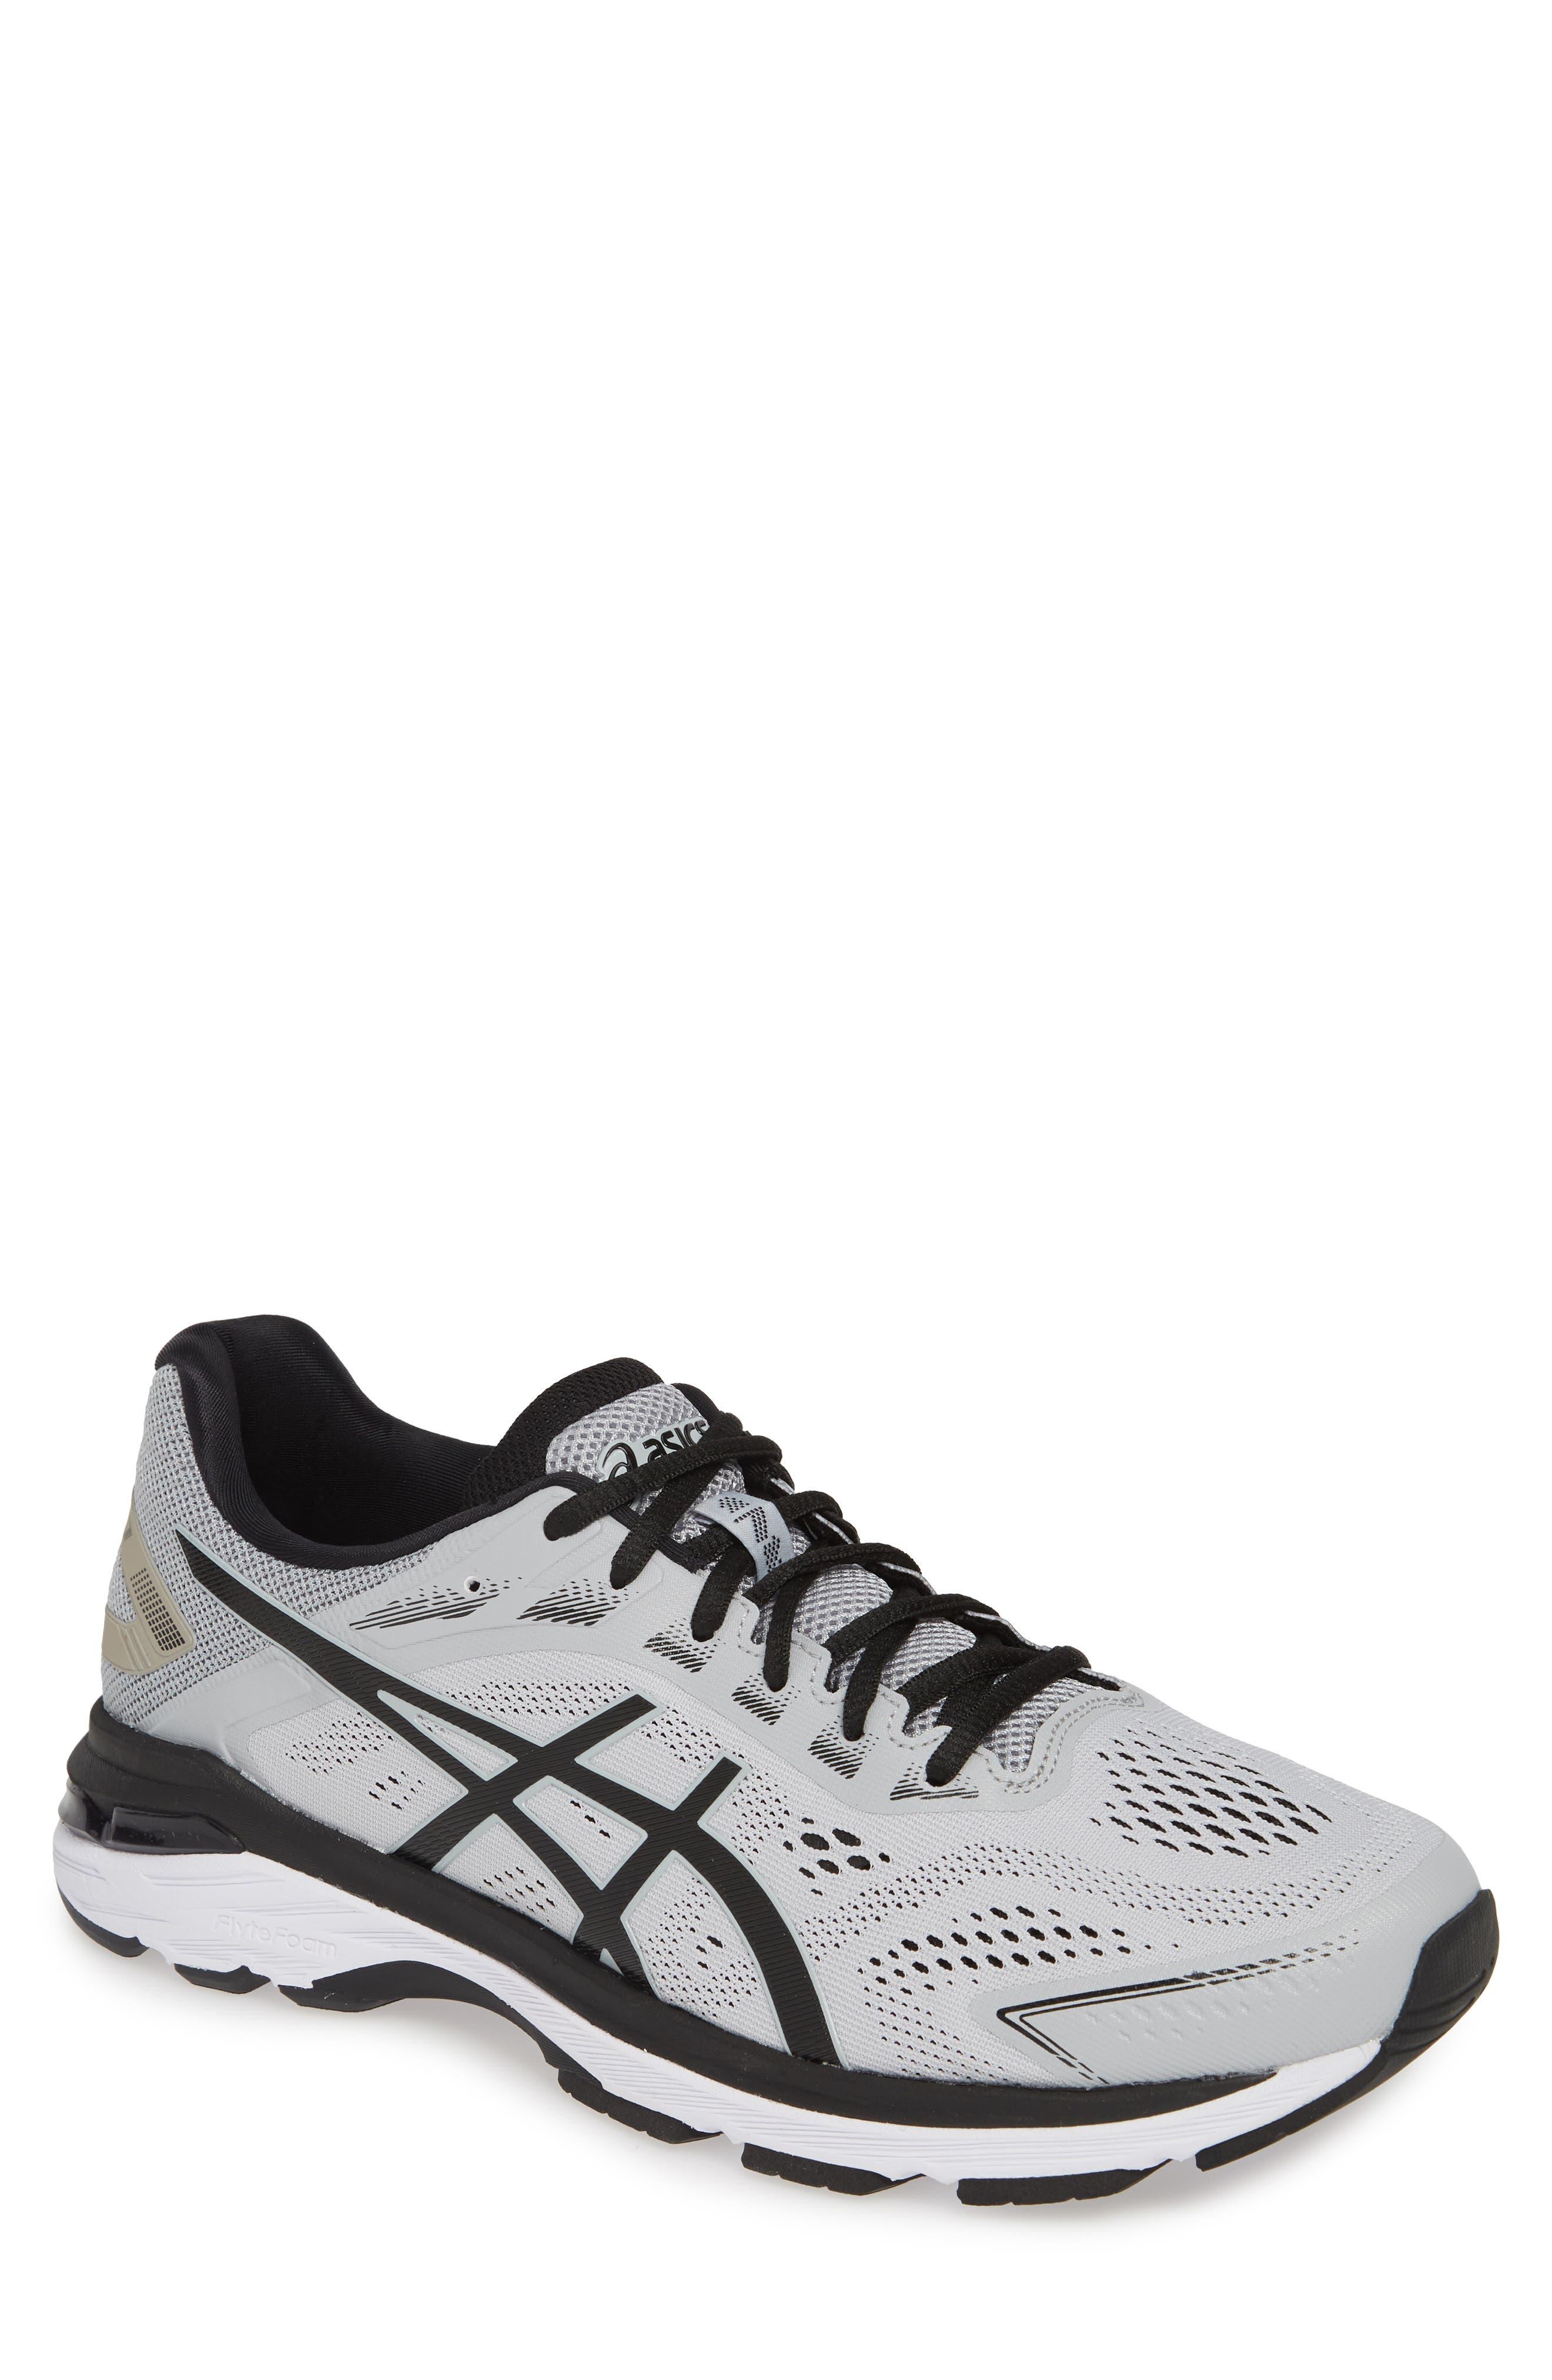 GT-2000 7 Running Shoe,                             Main thumbnail 1, color,                             MID GREY/ BLACK